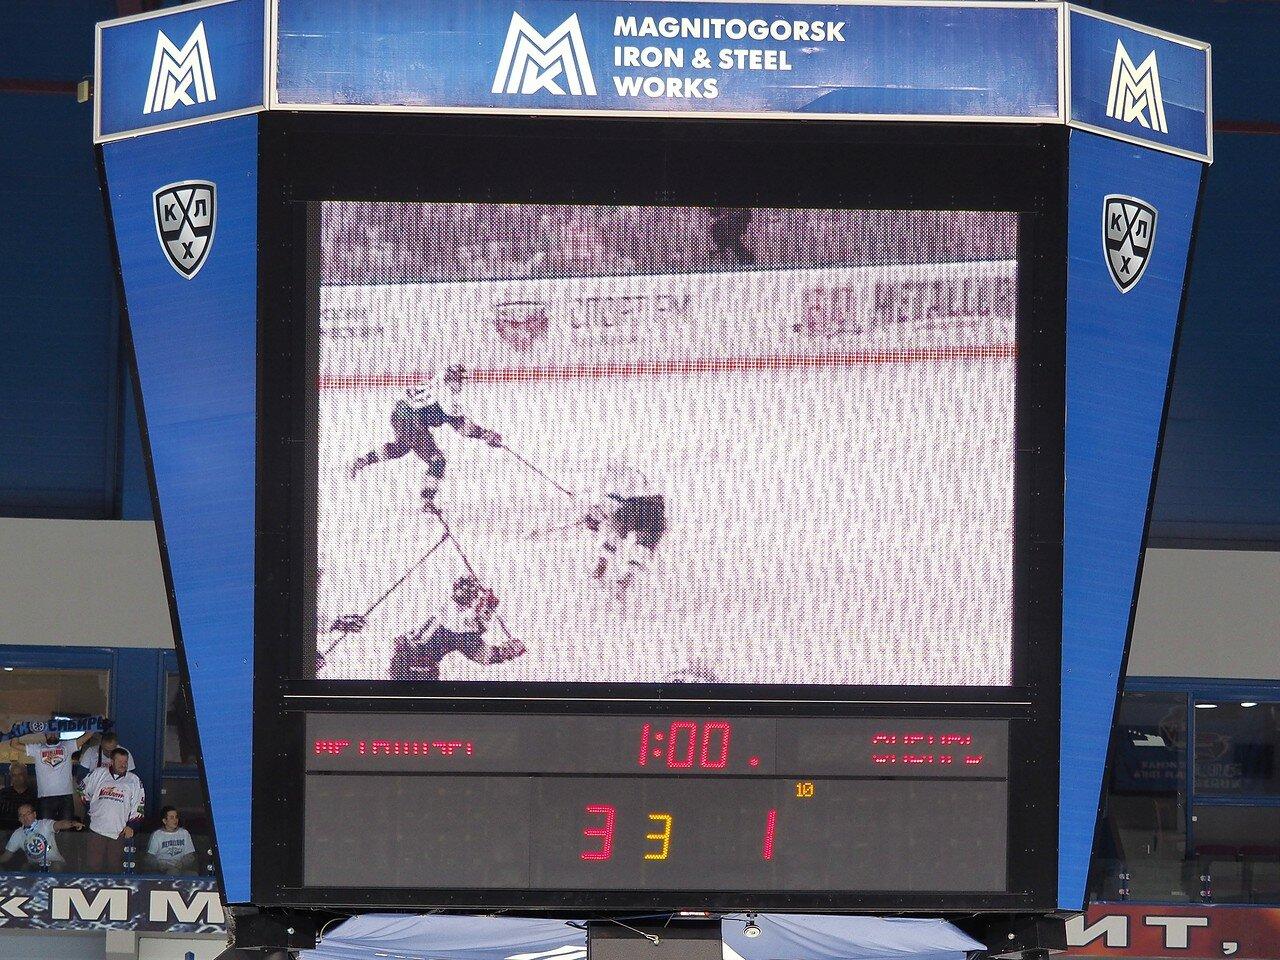 127Восток 1/2 плей-офф Металлург - Сибирь 08.03.2016